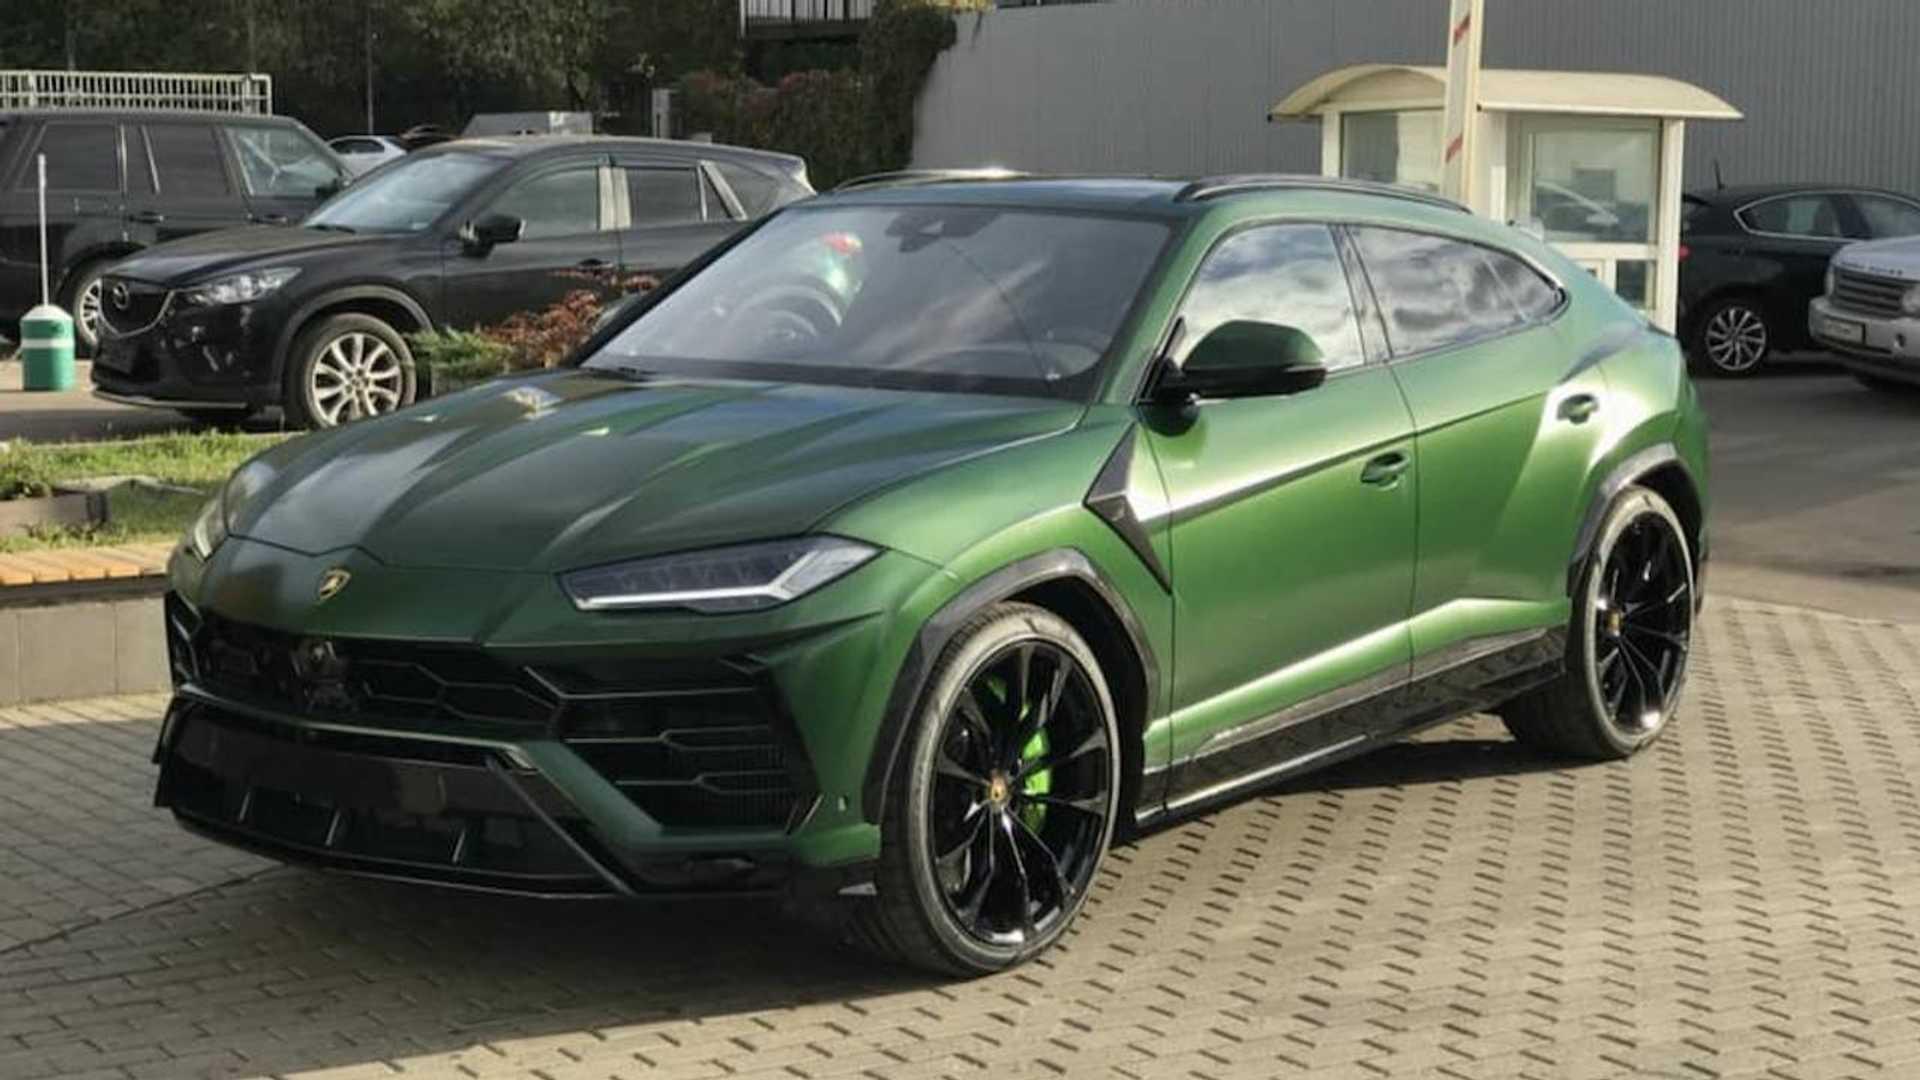 Le Lamborghini Urus Devient Plus Menacant Grace A Topcar Design